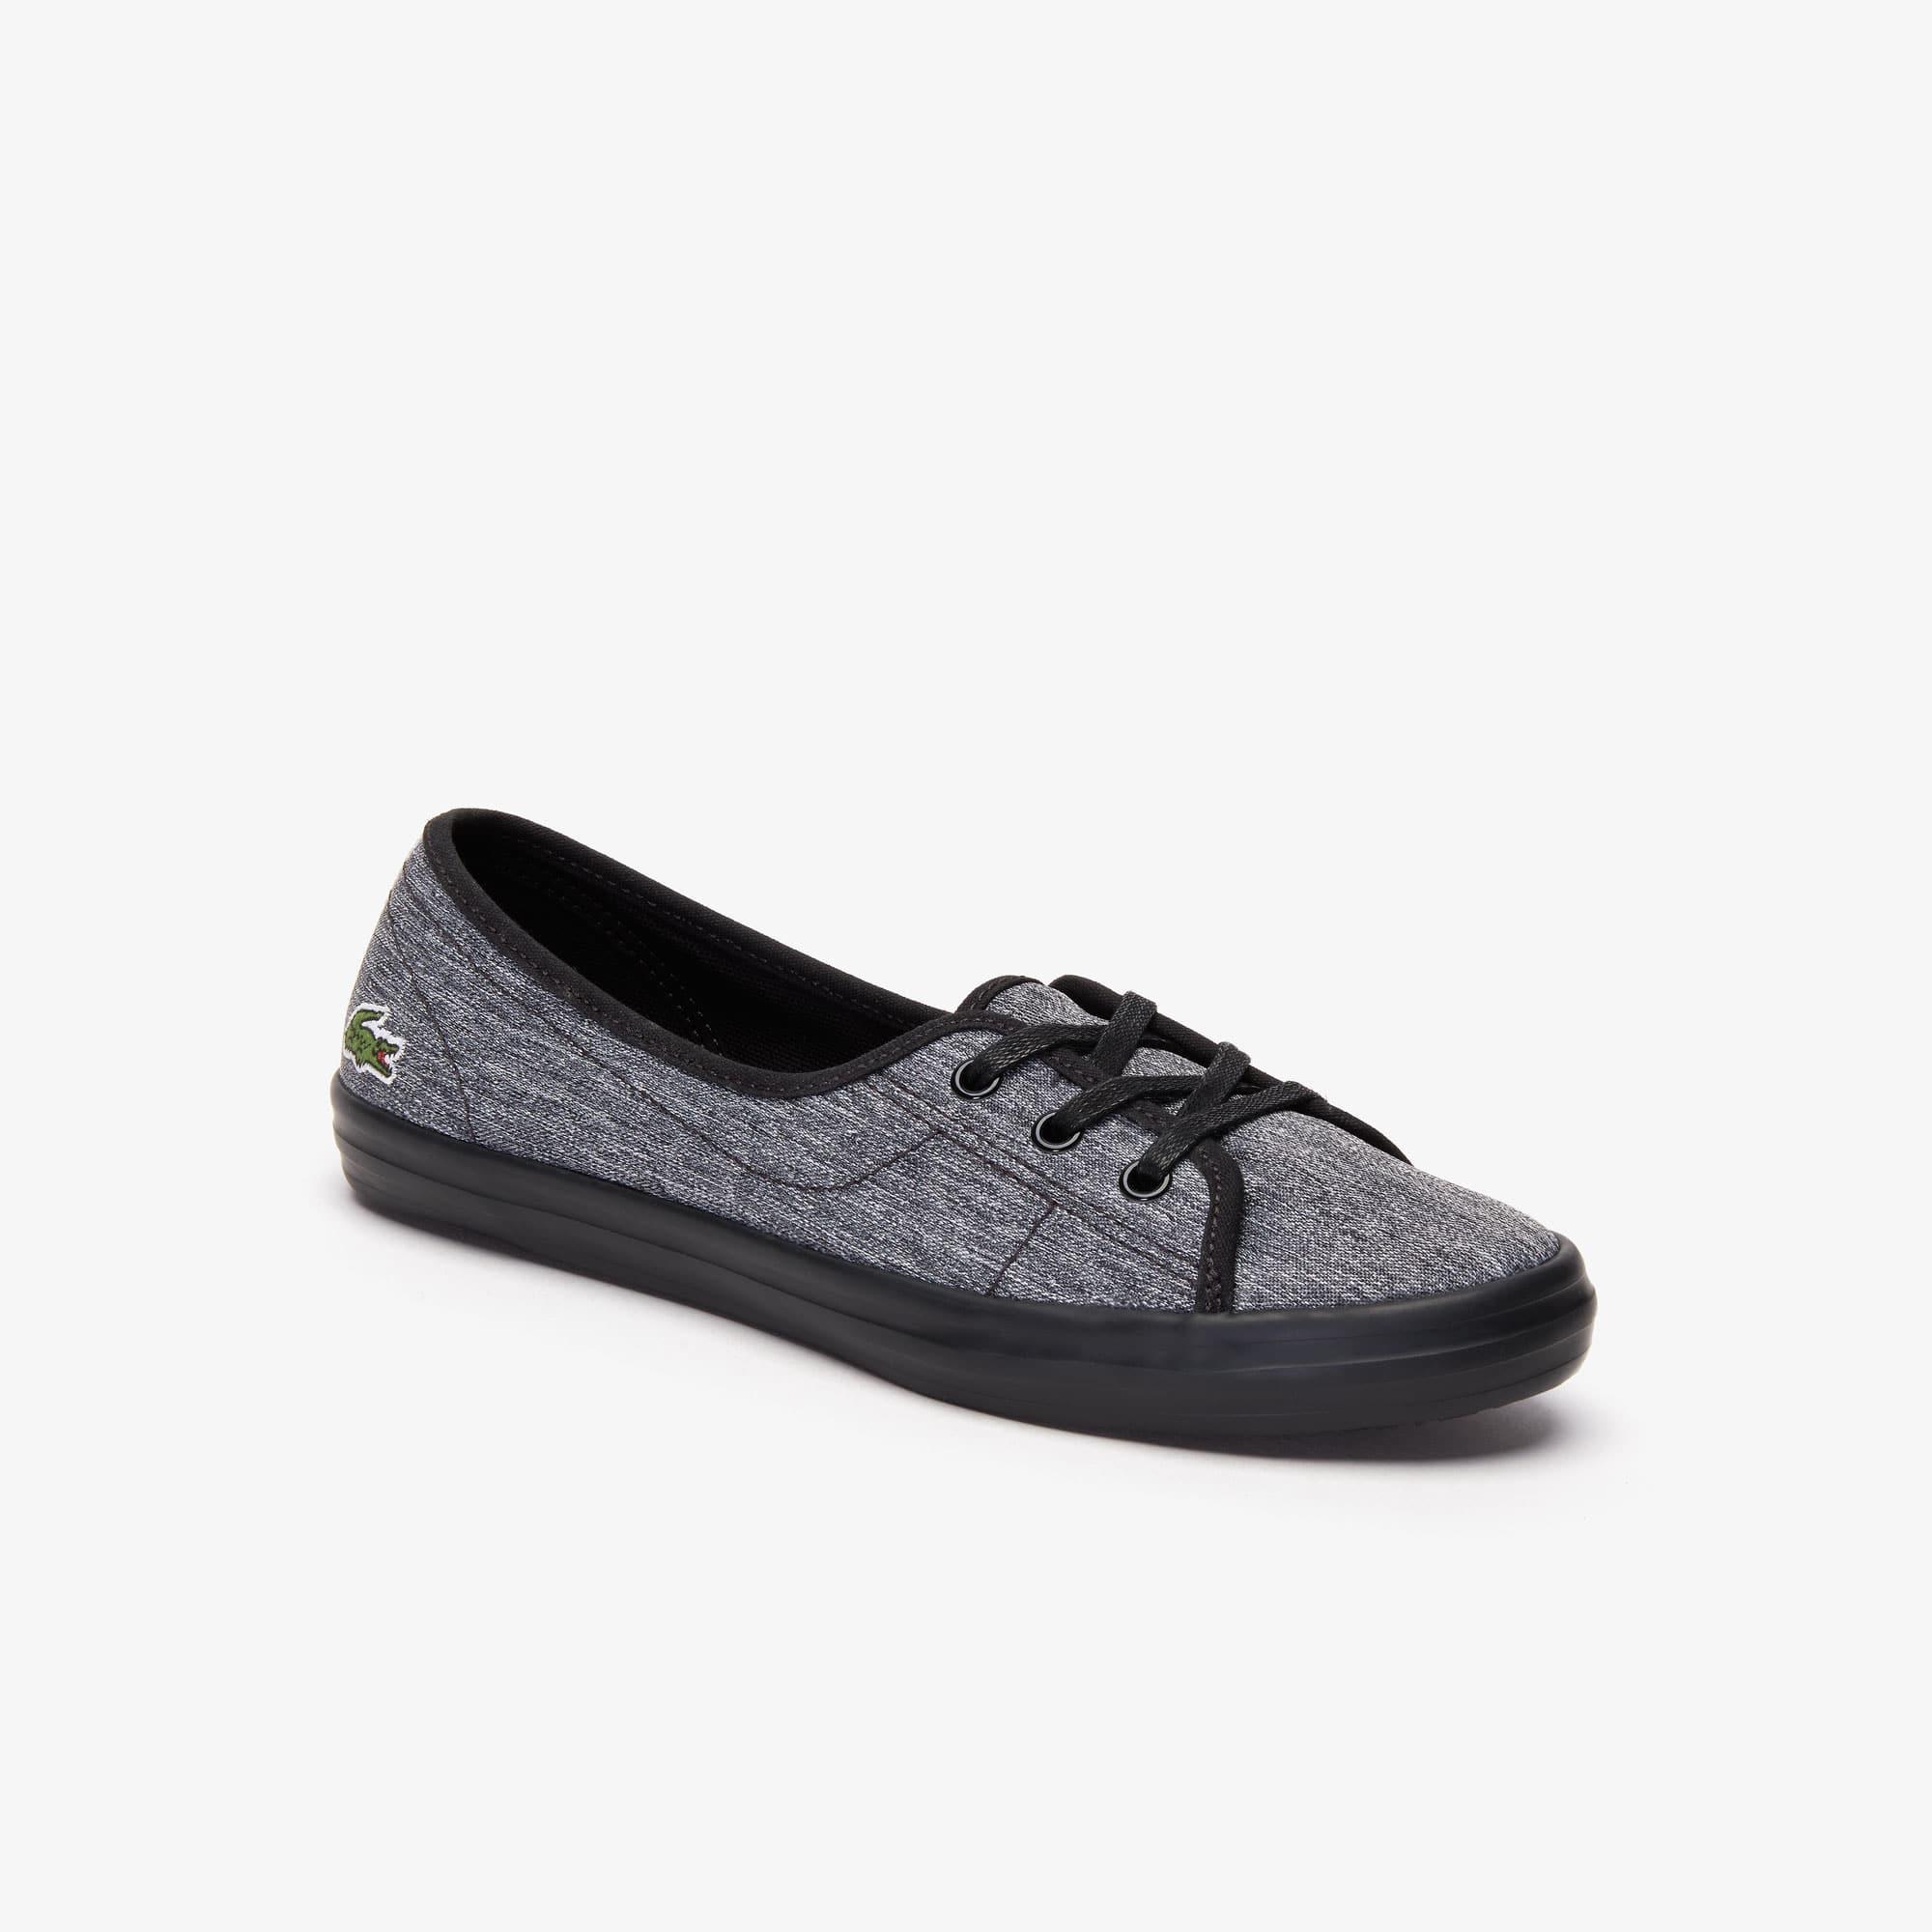 c645d37ca039 Chaussures femme   Collection Femme   LACOSTE